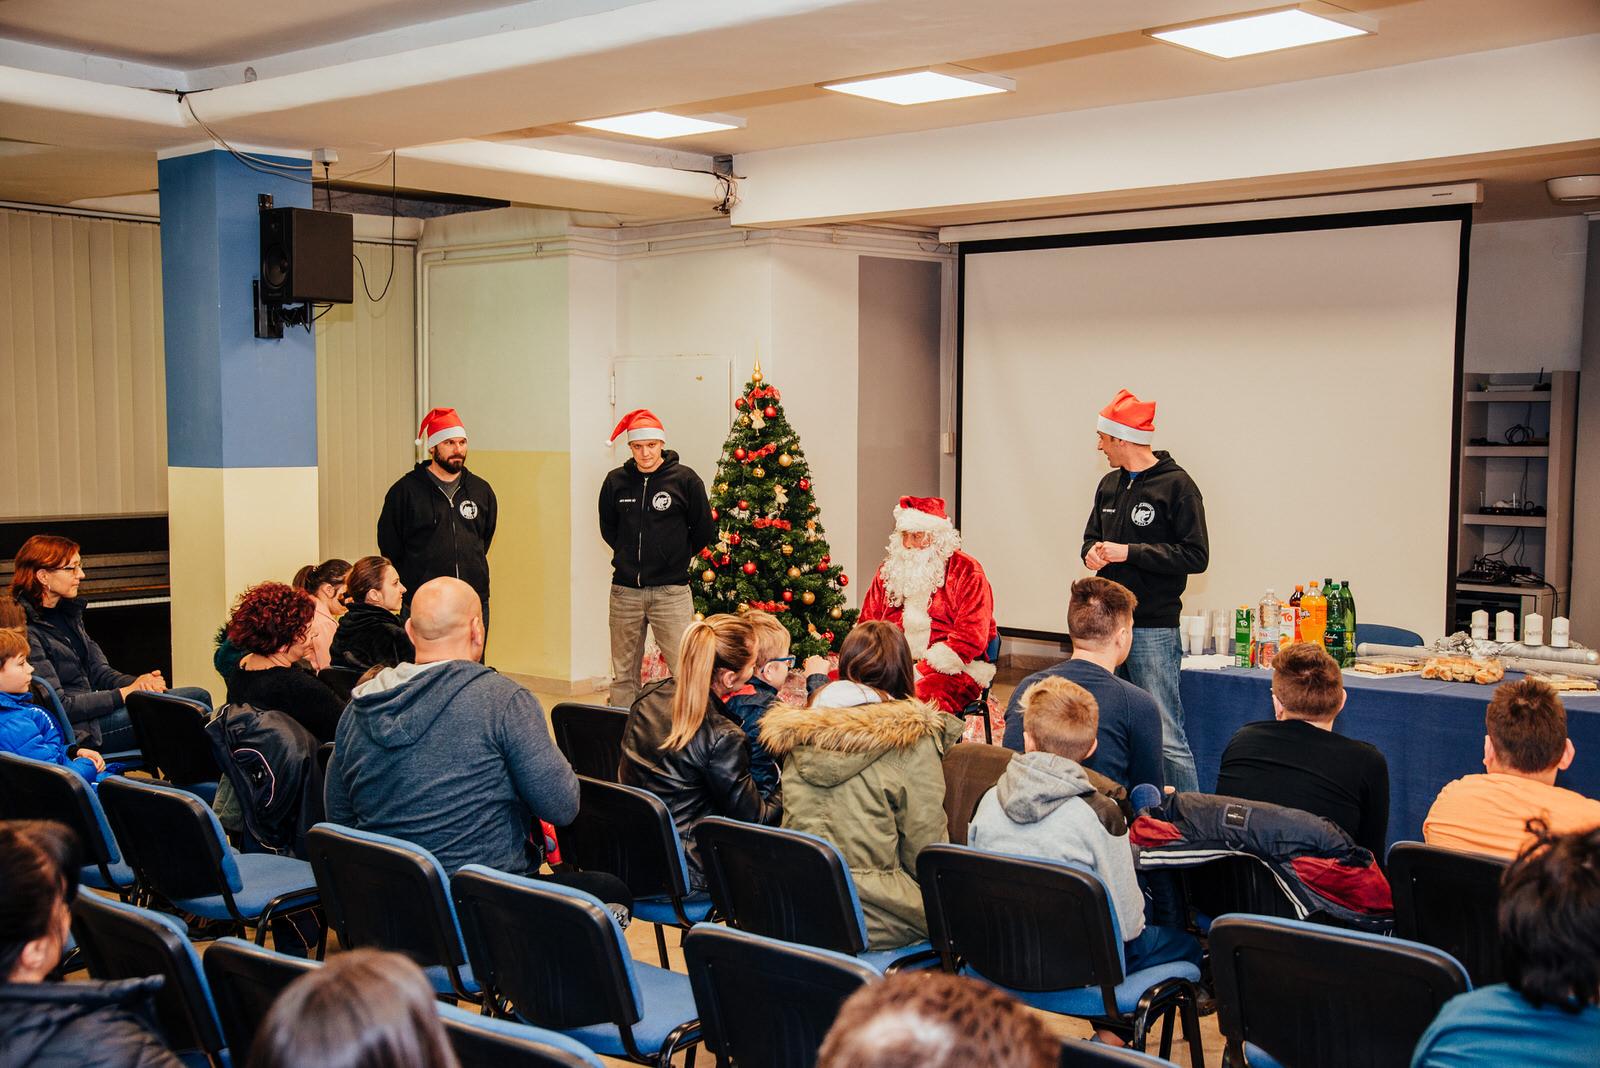 likaclub_airsoft-team-gospić-i-udruga-pčelice_2019-13